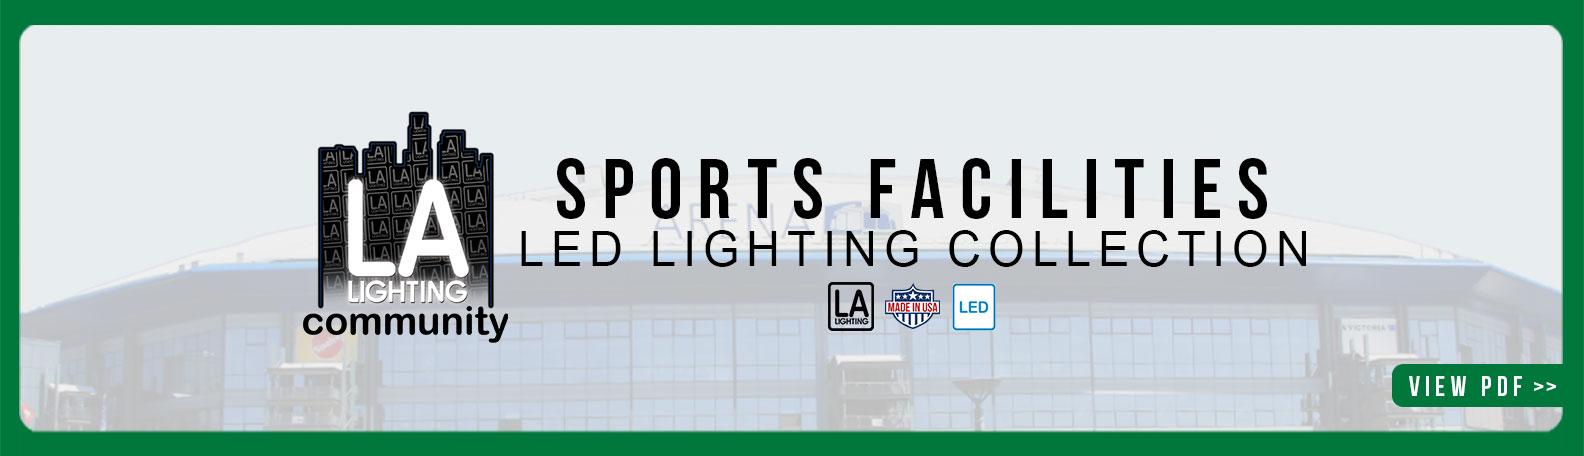 header_MAIN_sports_facilities